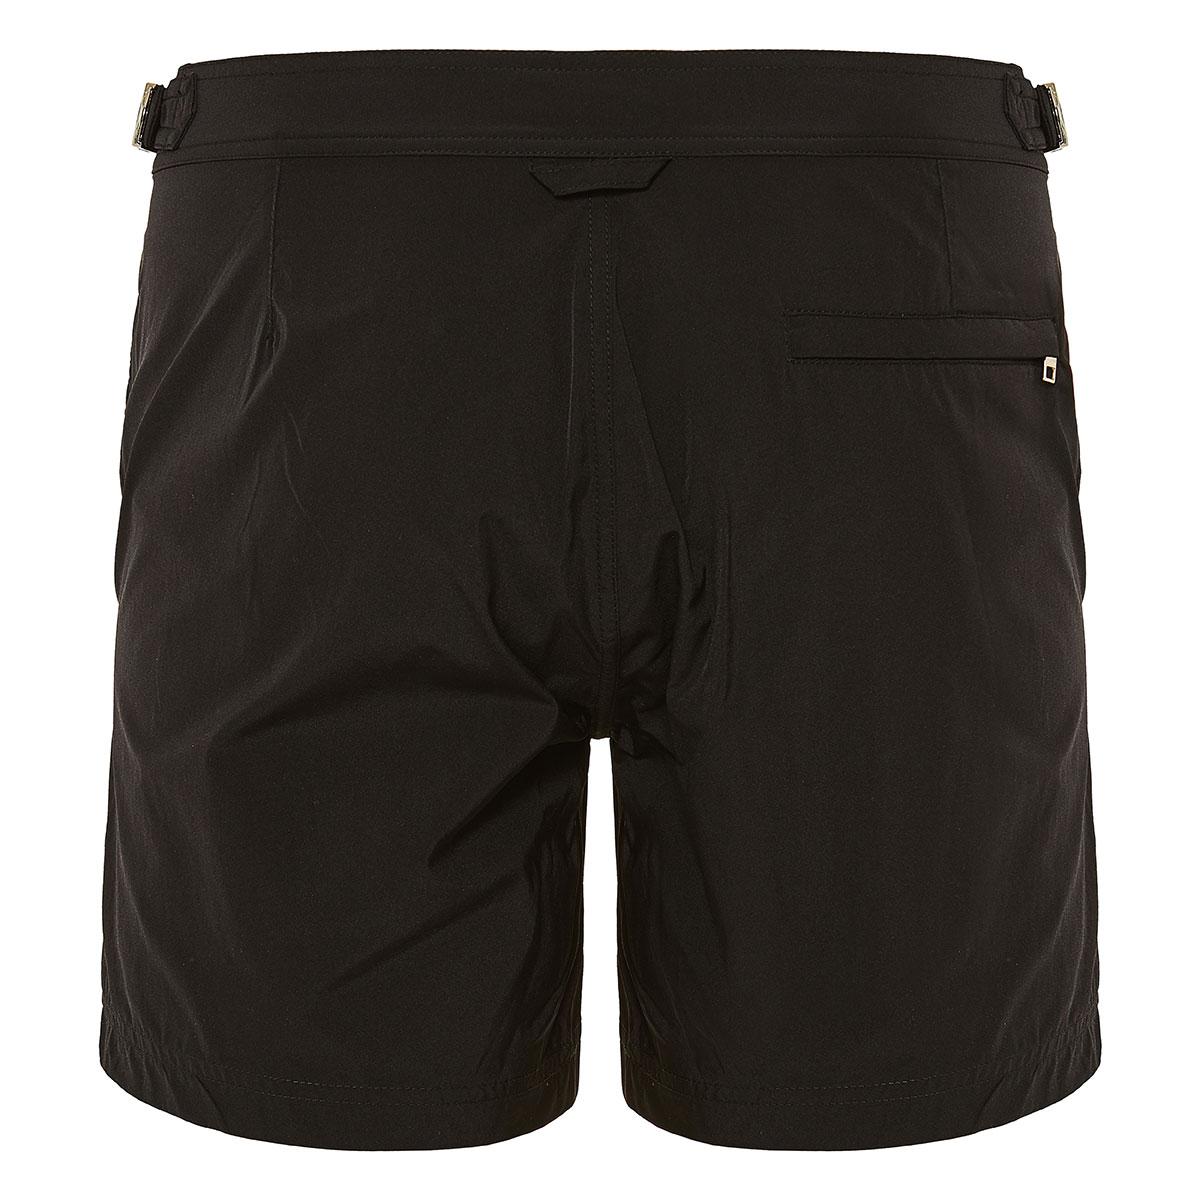 Dragon patch swim shorts